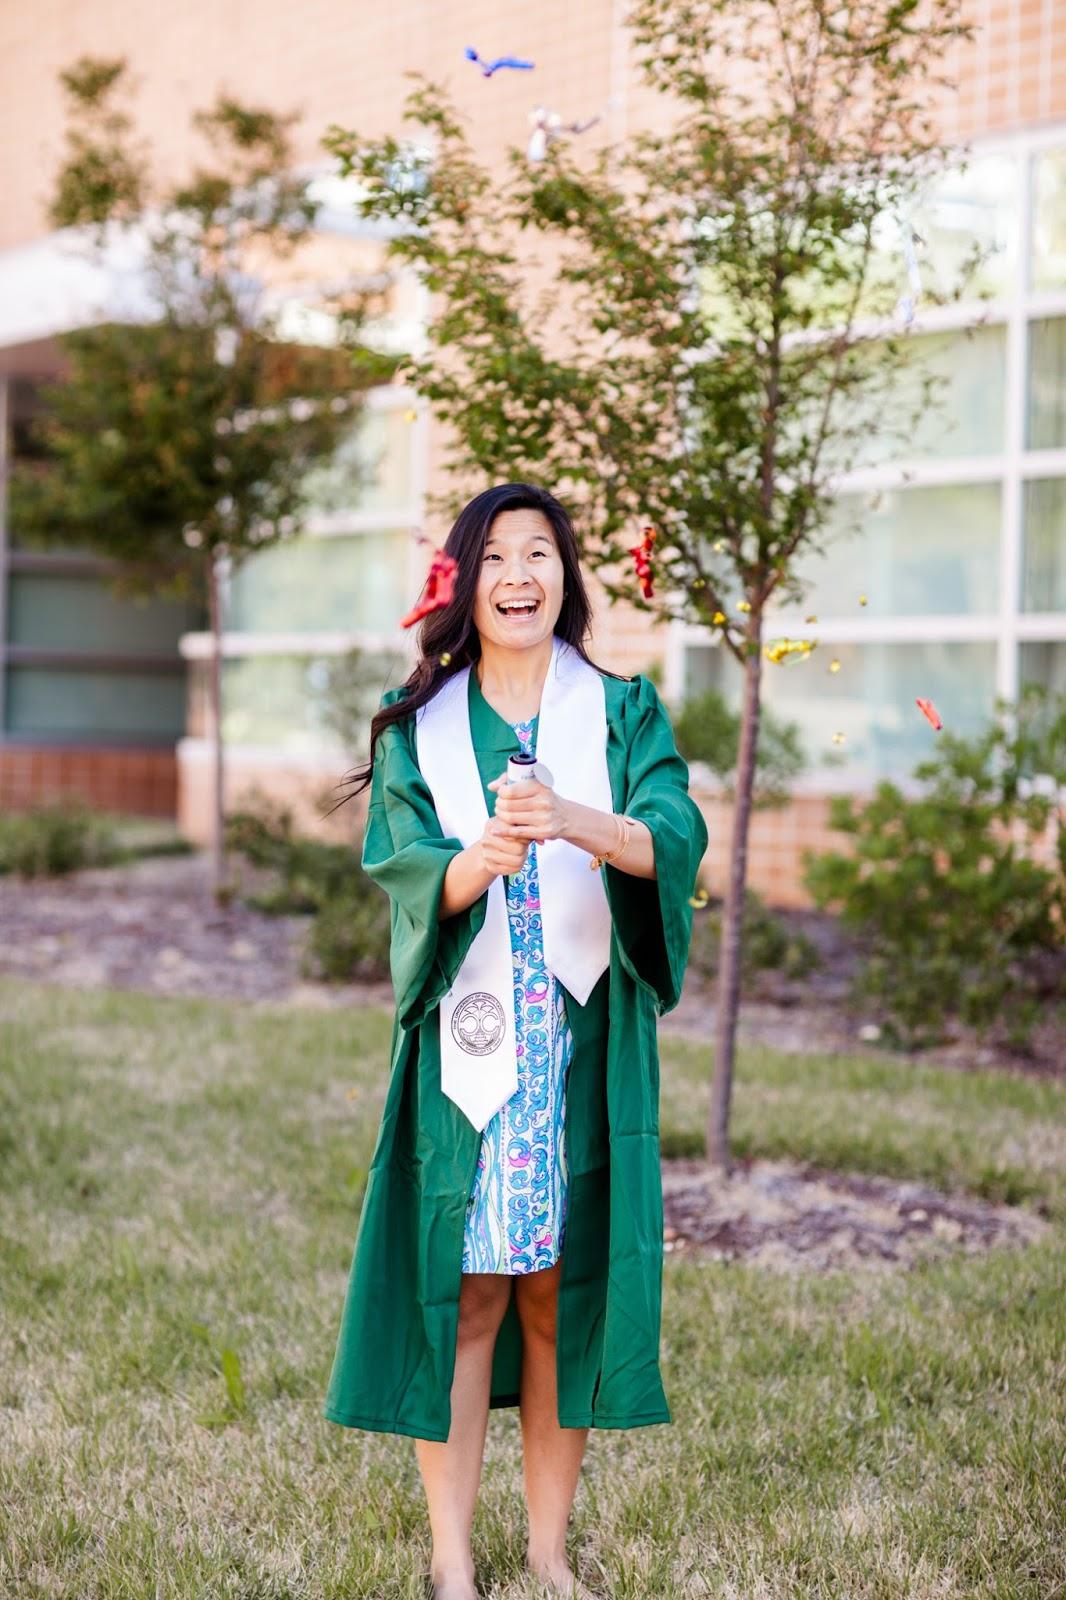 Graduation Photo Inspiration